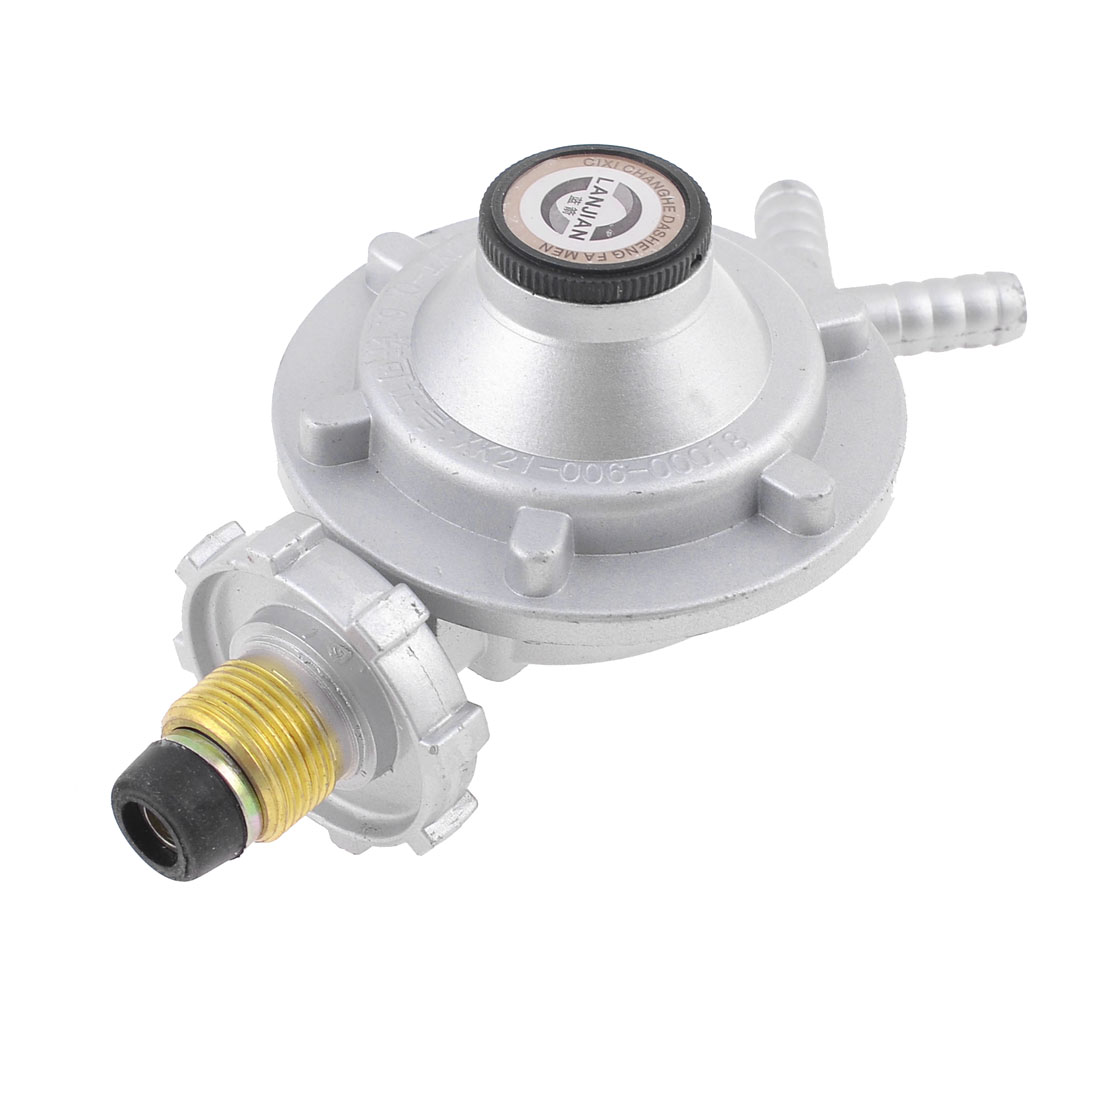 Bottled Compressed Gas Pressure Regulator Valve Coffee Silver Tone